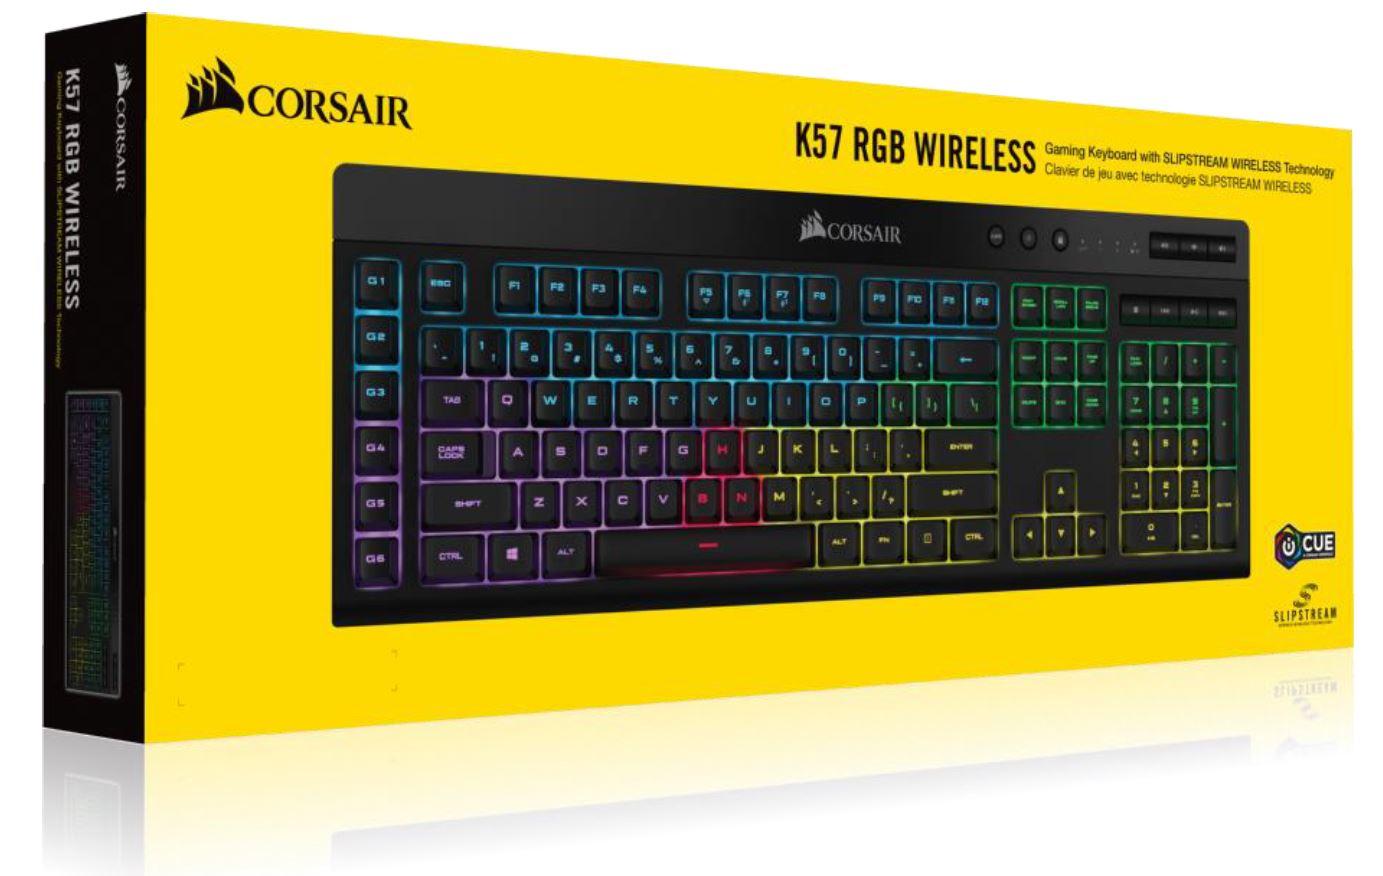 Corsair K57 RGB Wireless Keyboard with SLIPSTREAM Technology